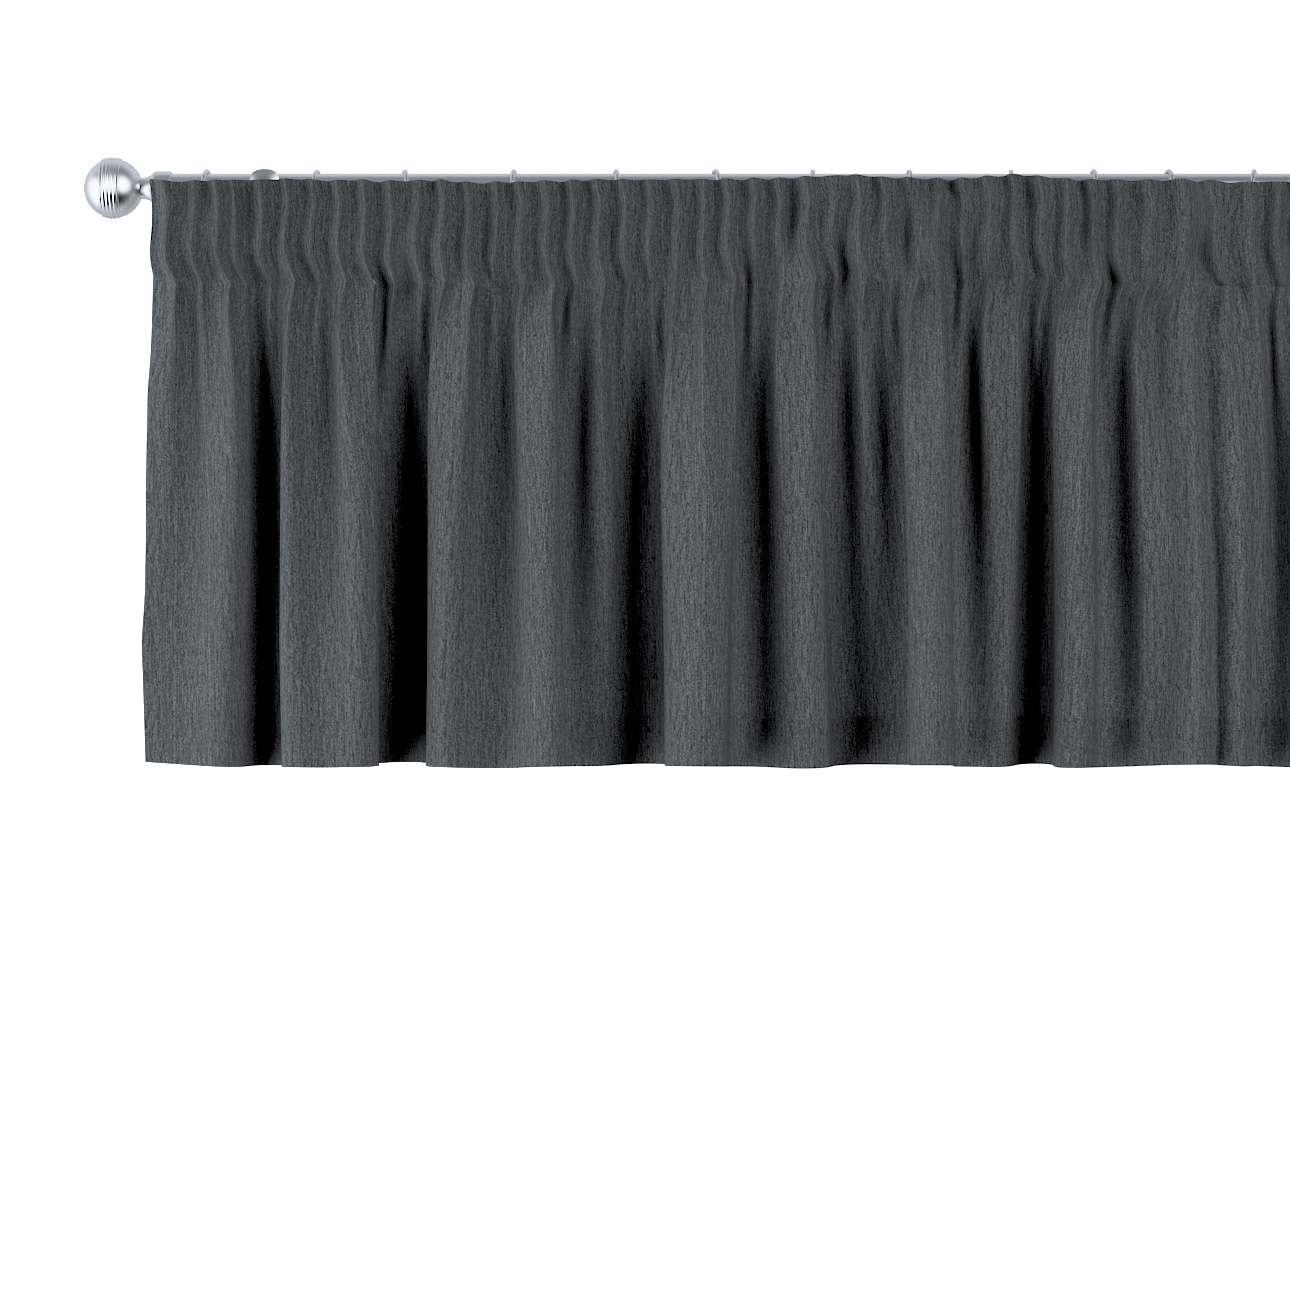 Pencil pleat pelmet in collection Chenille, fabric: 702-20